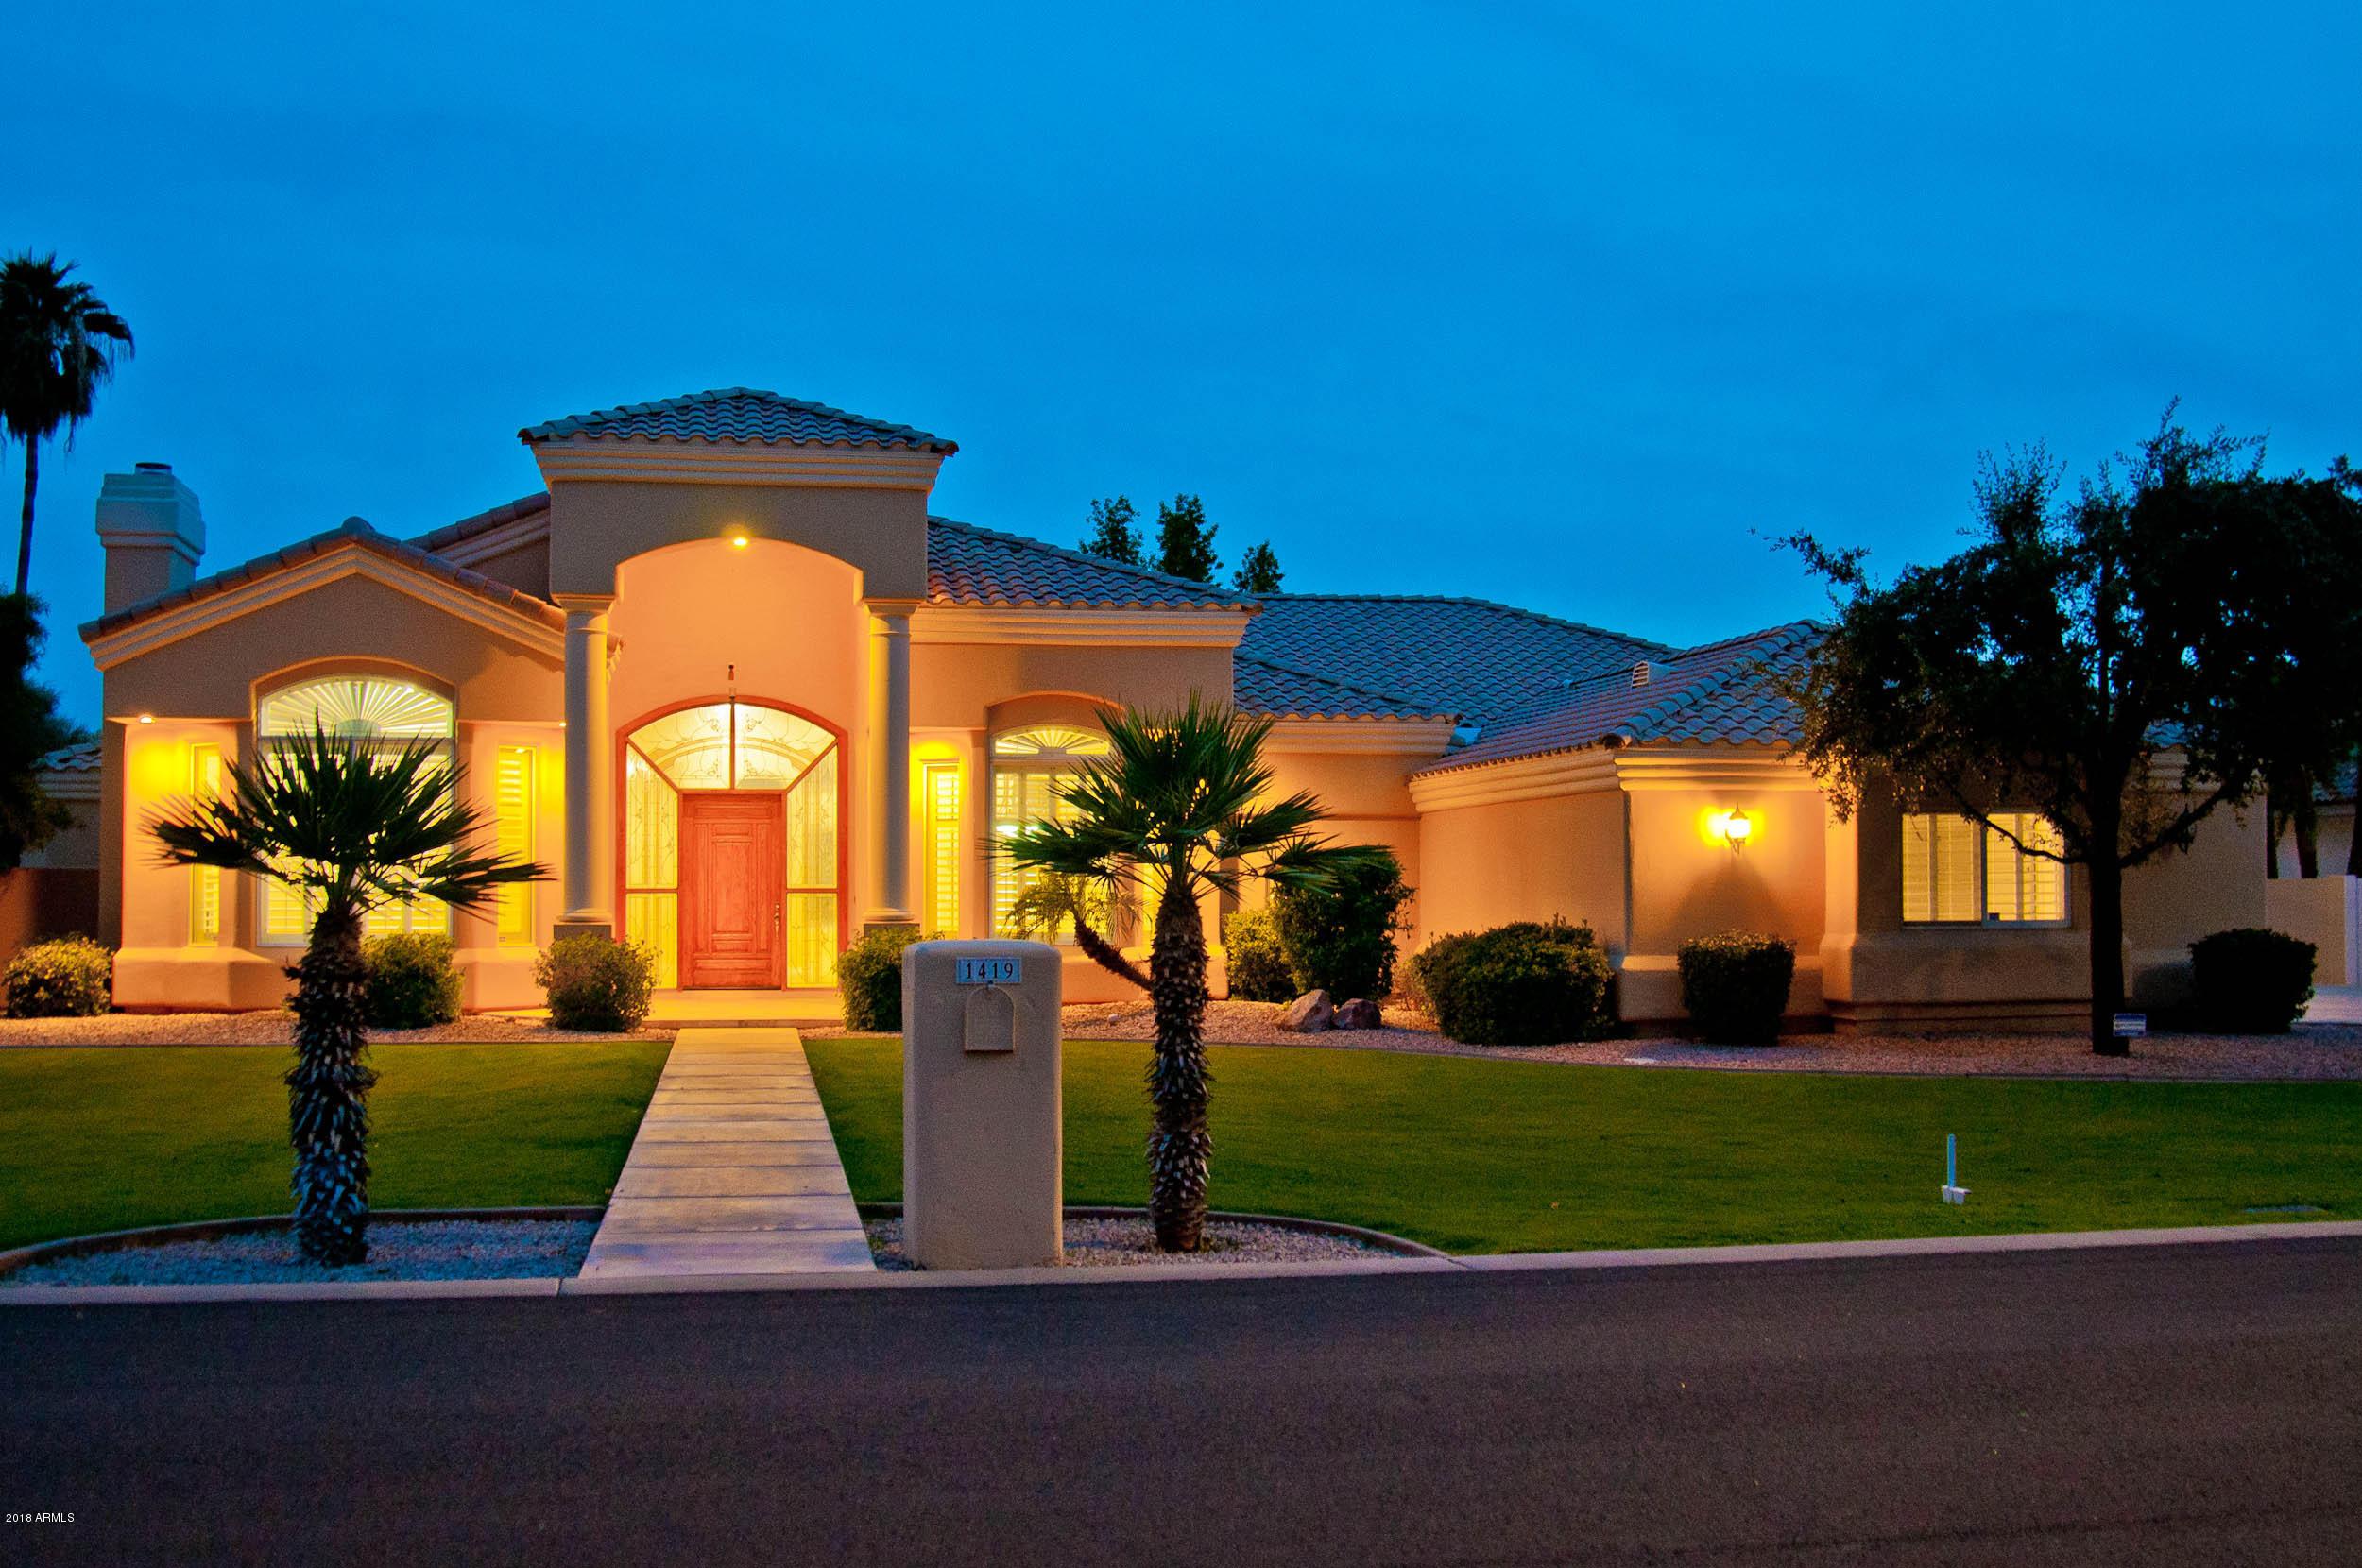 MLS 5856902 1419 E PALOMINO Drive, Tempe, AZ 85284 Tempe